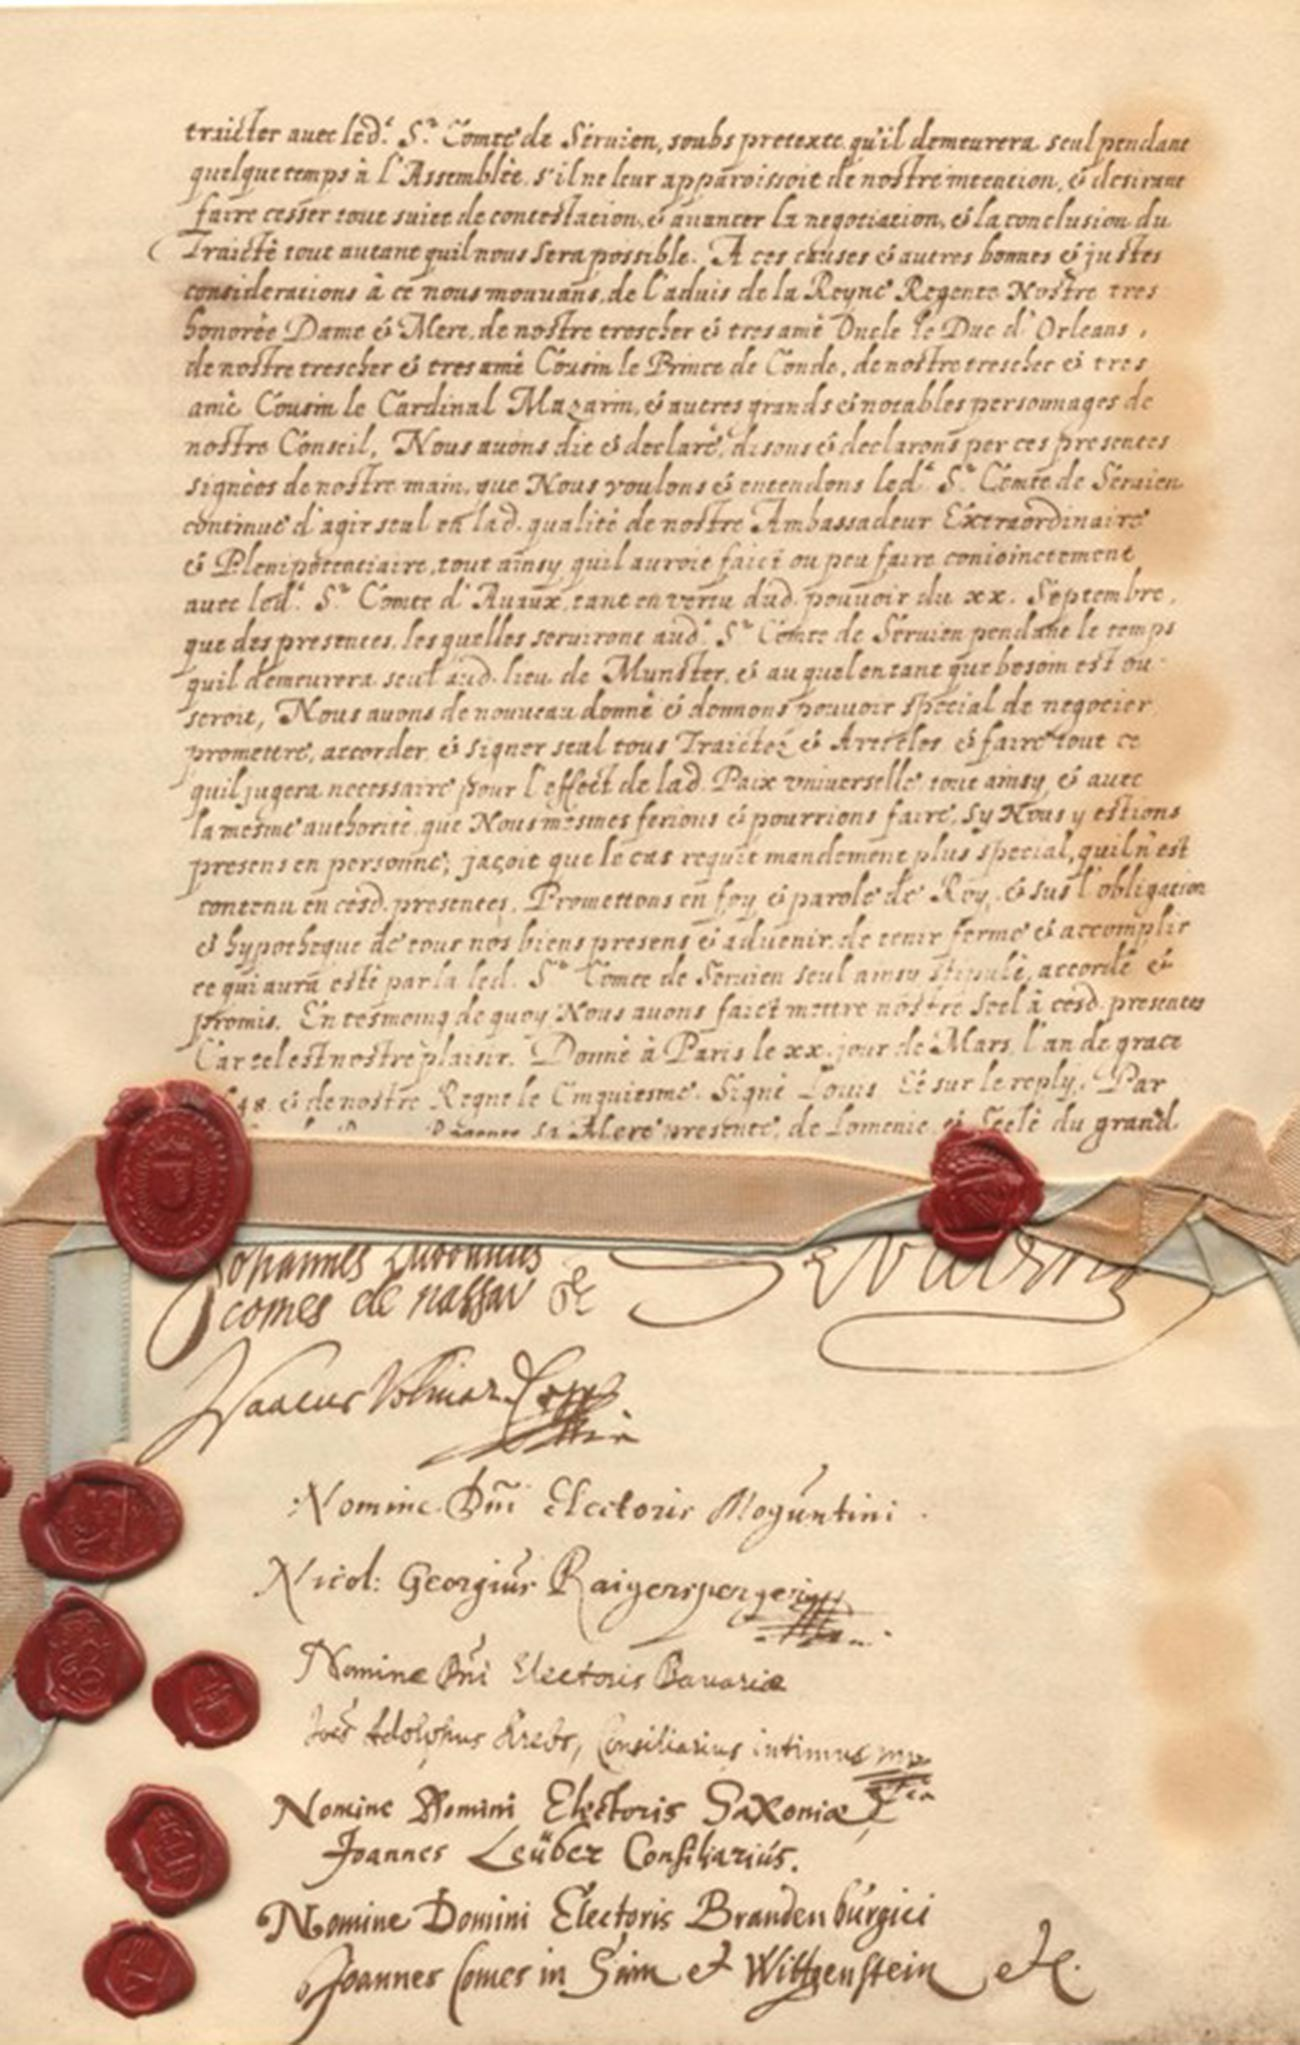 Страница од Вестфалскиот договор на француски јазик.